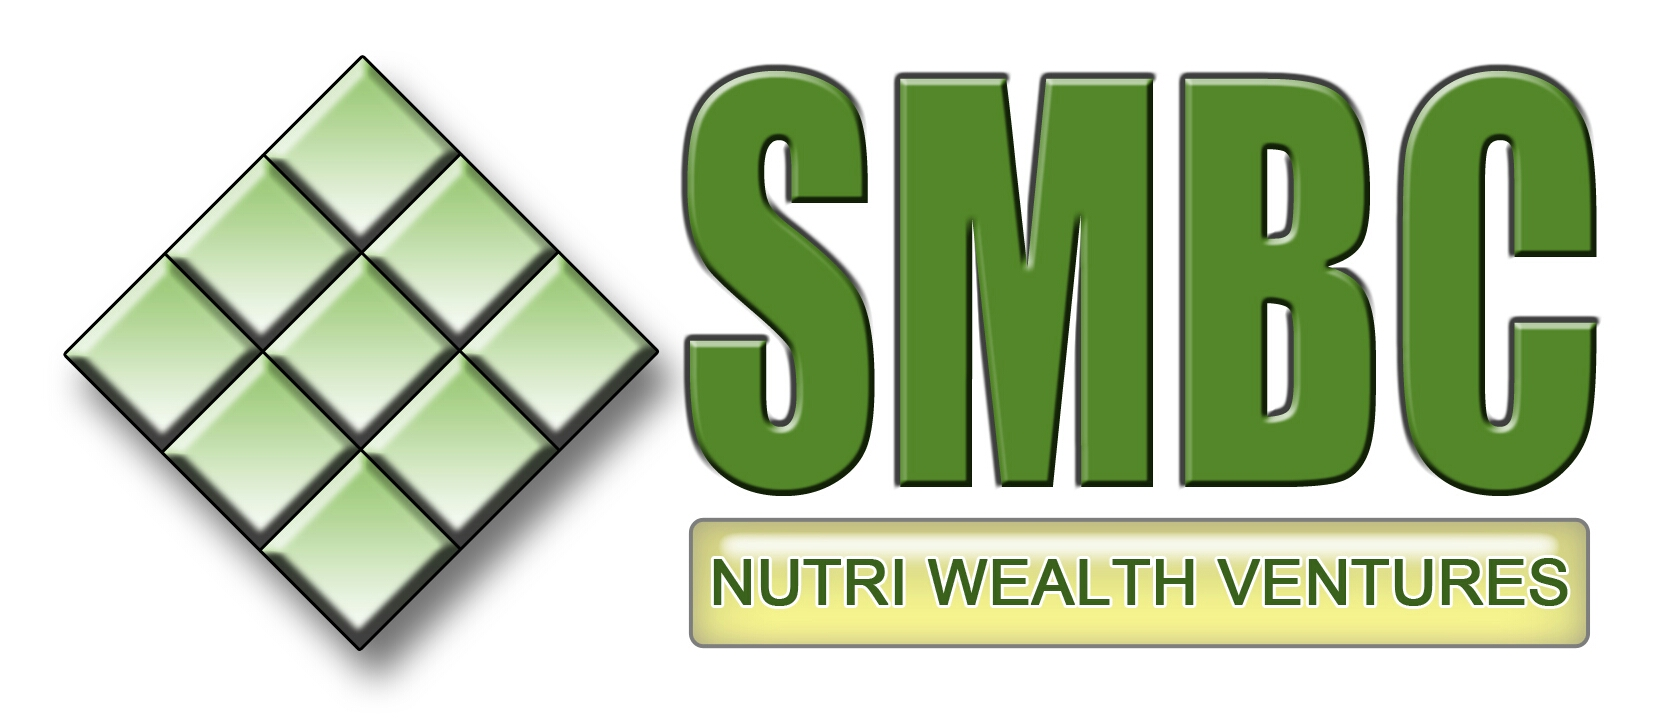 Mineral Premix Suppliers in Philippines - Livestock1 com